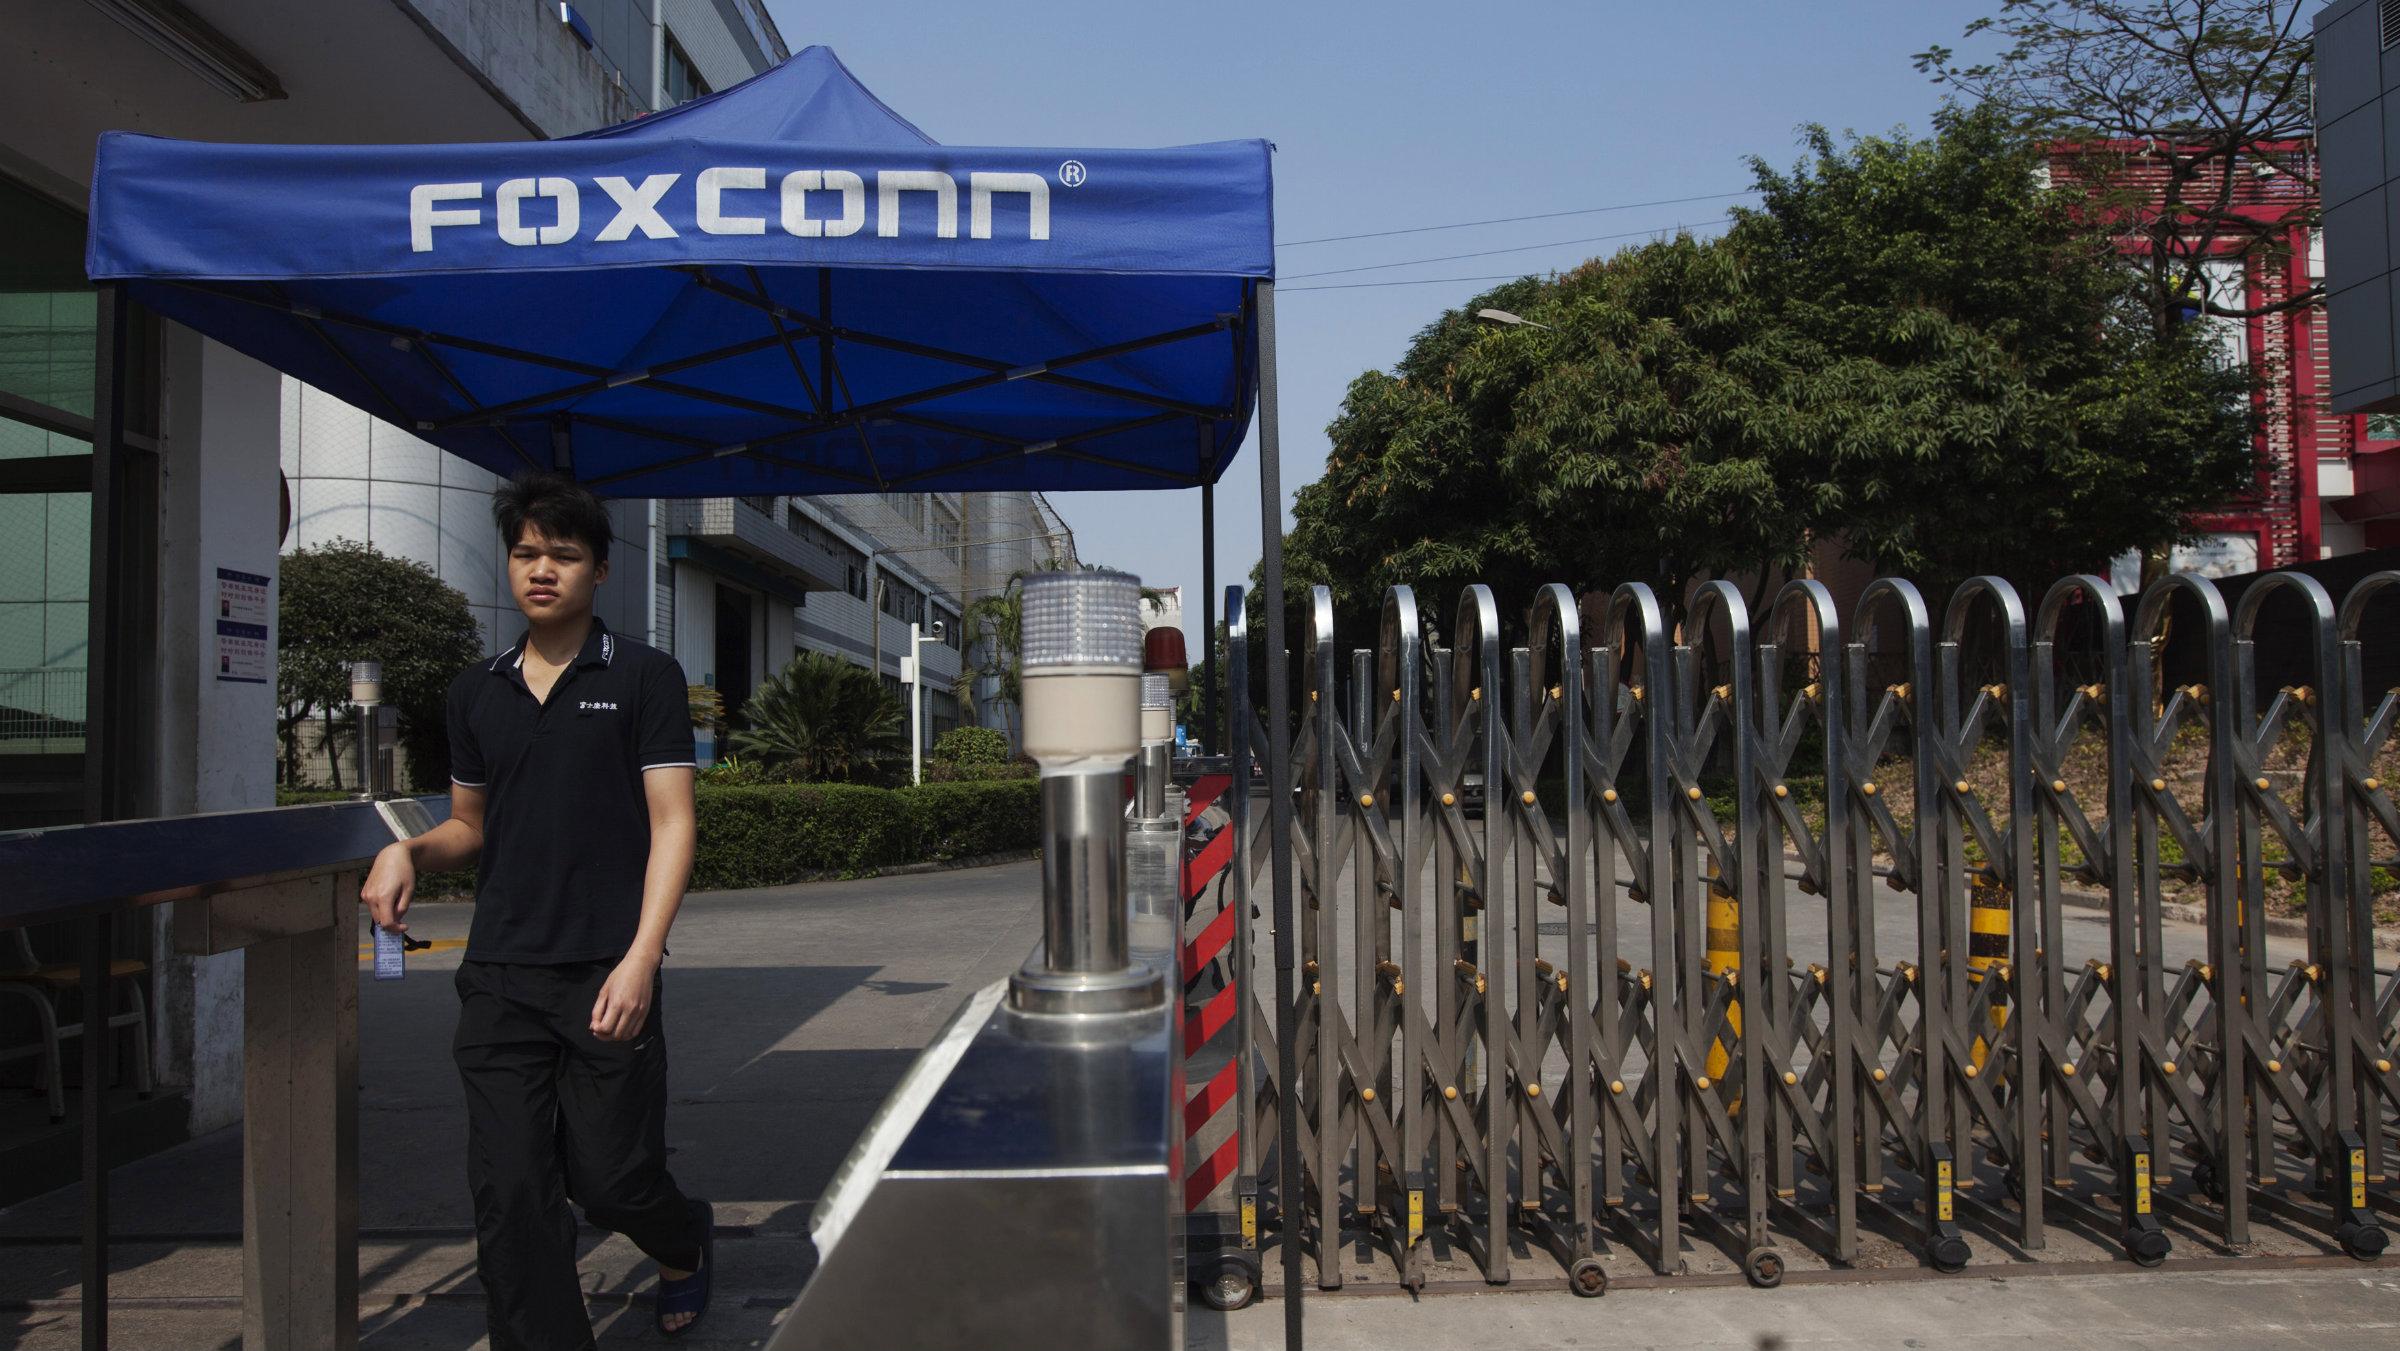 Foxconn Hon Hai smartphones